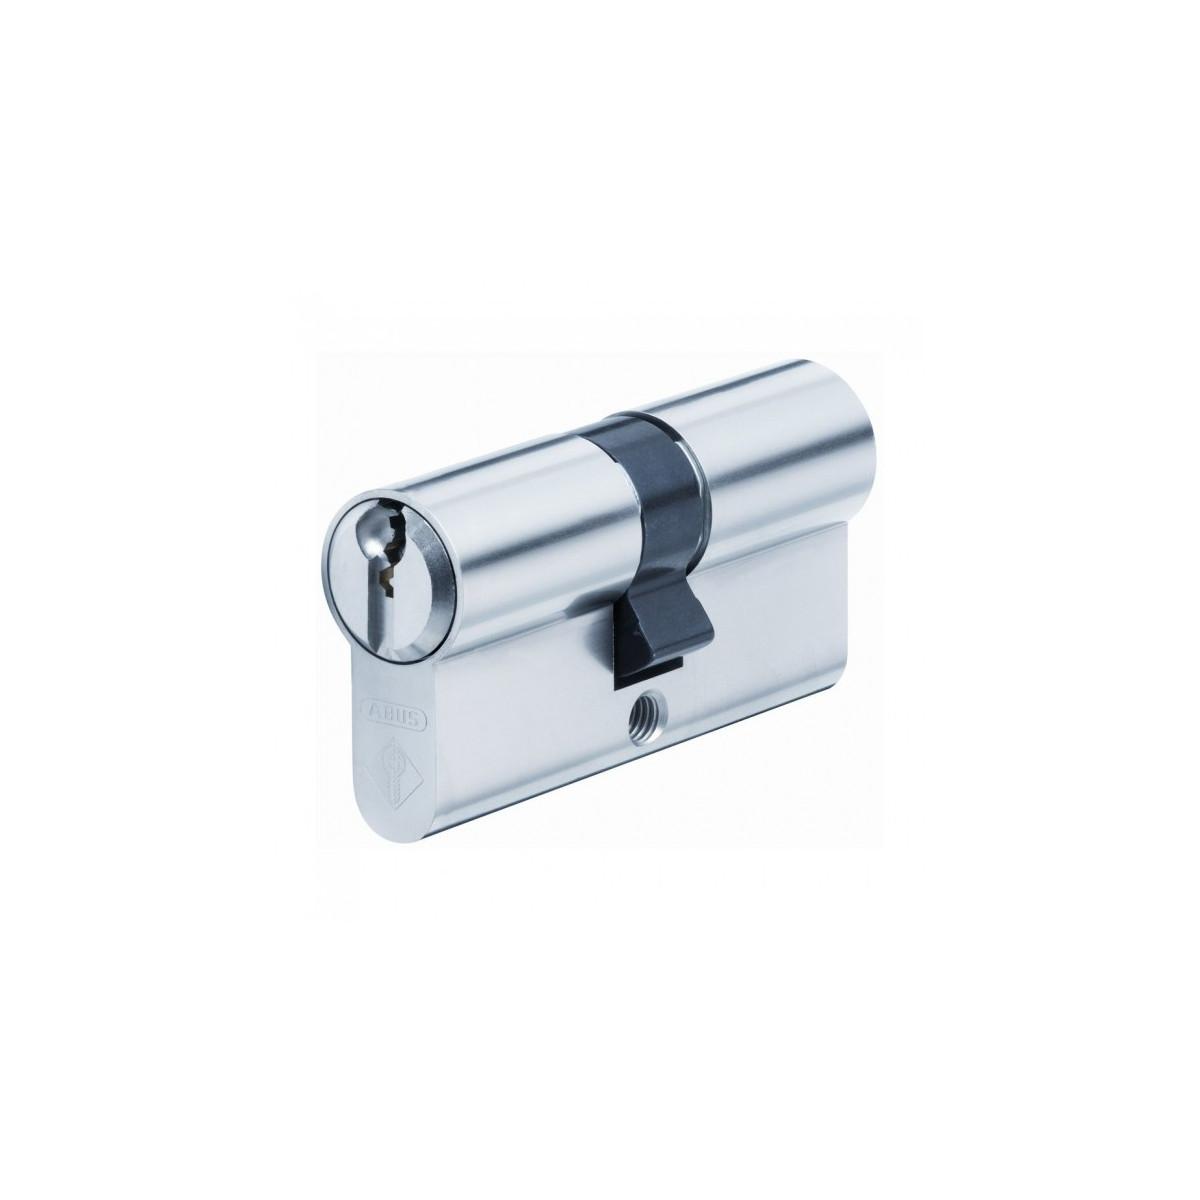 cylindre de serrure abus zolit 2000 2 entr es de cl clef en ligne. Black Bedroom Furniture Sets. Home Design Ideas